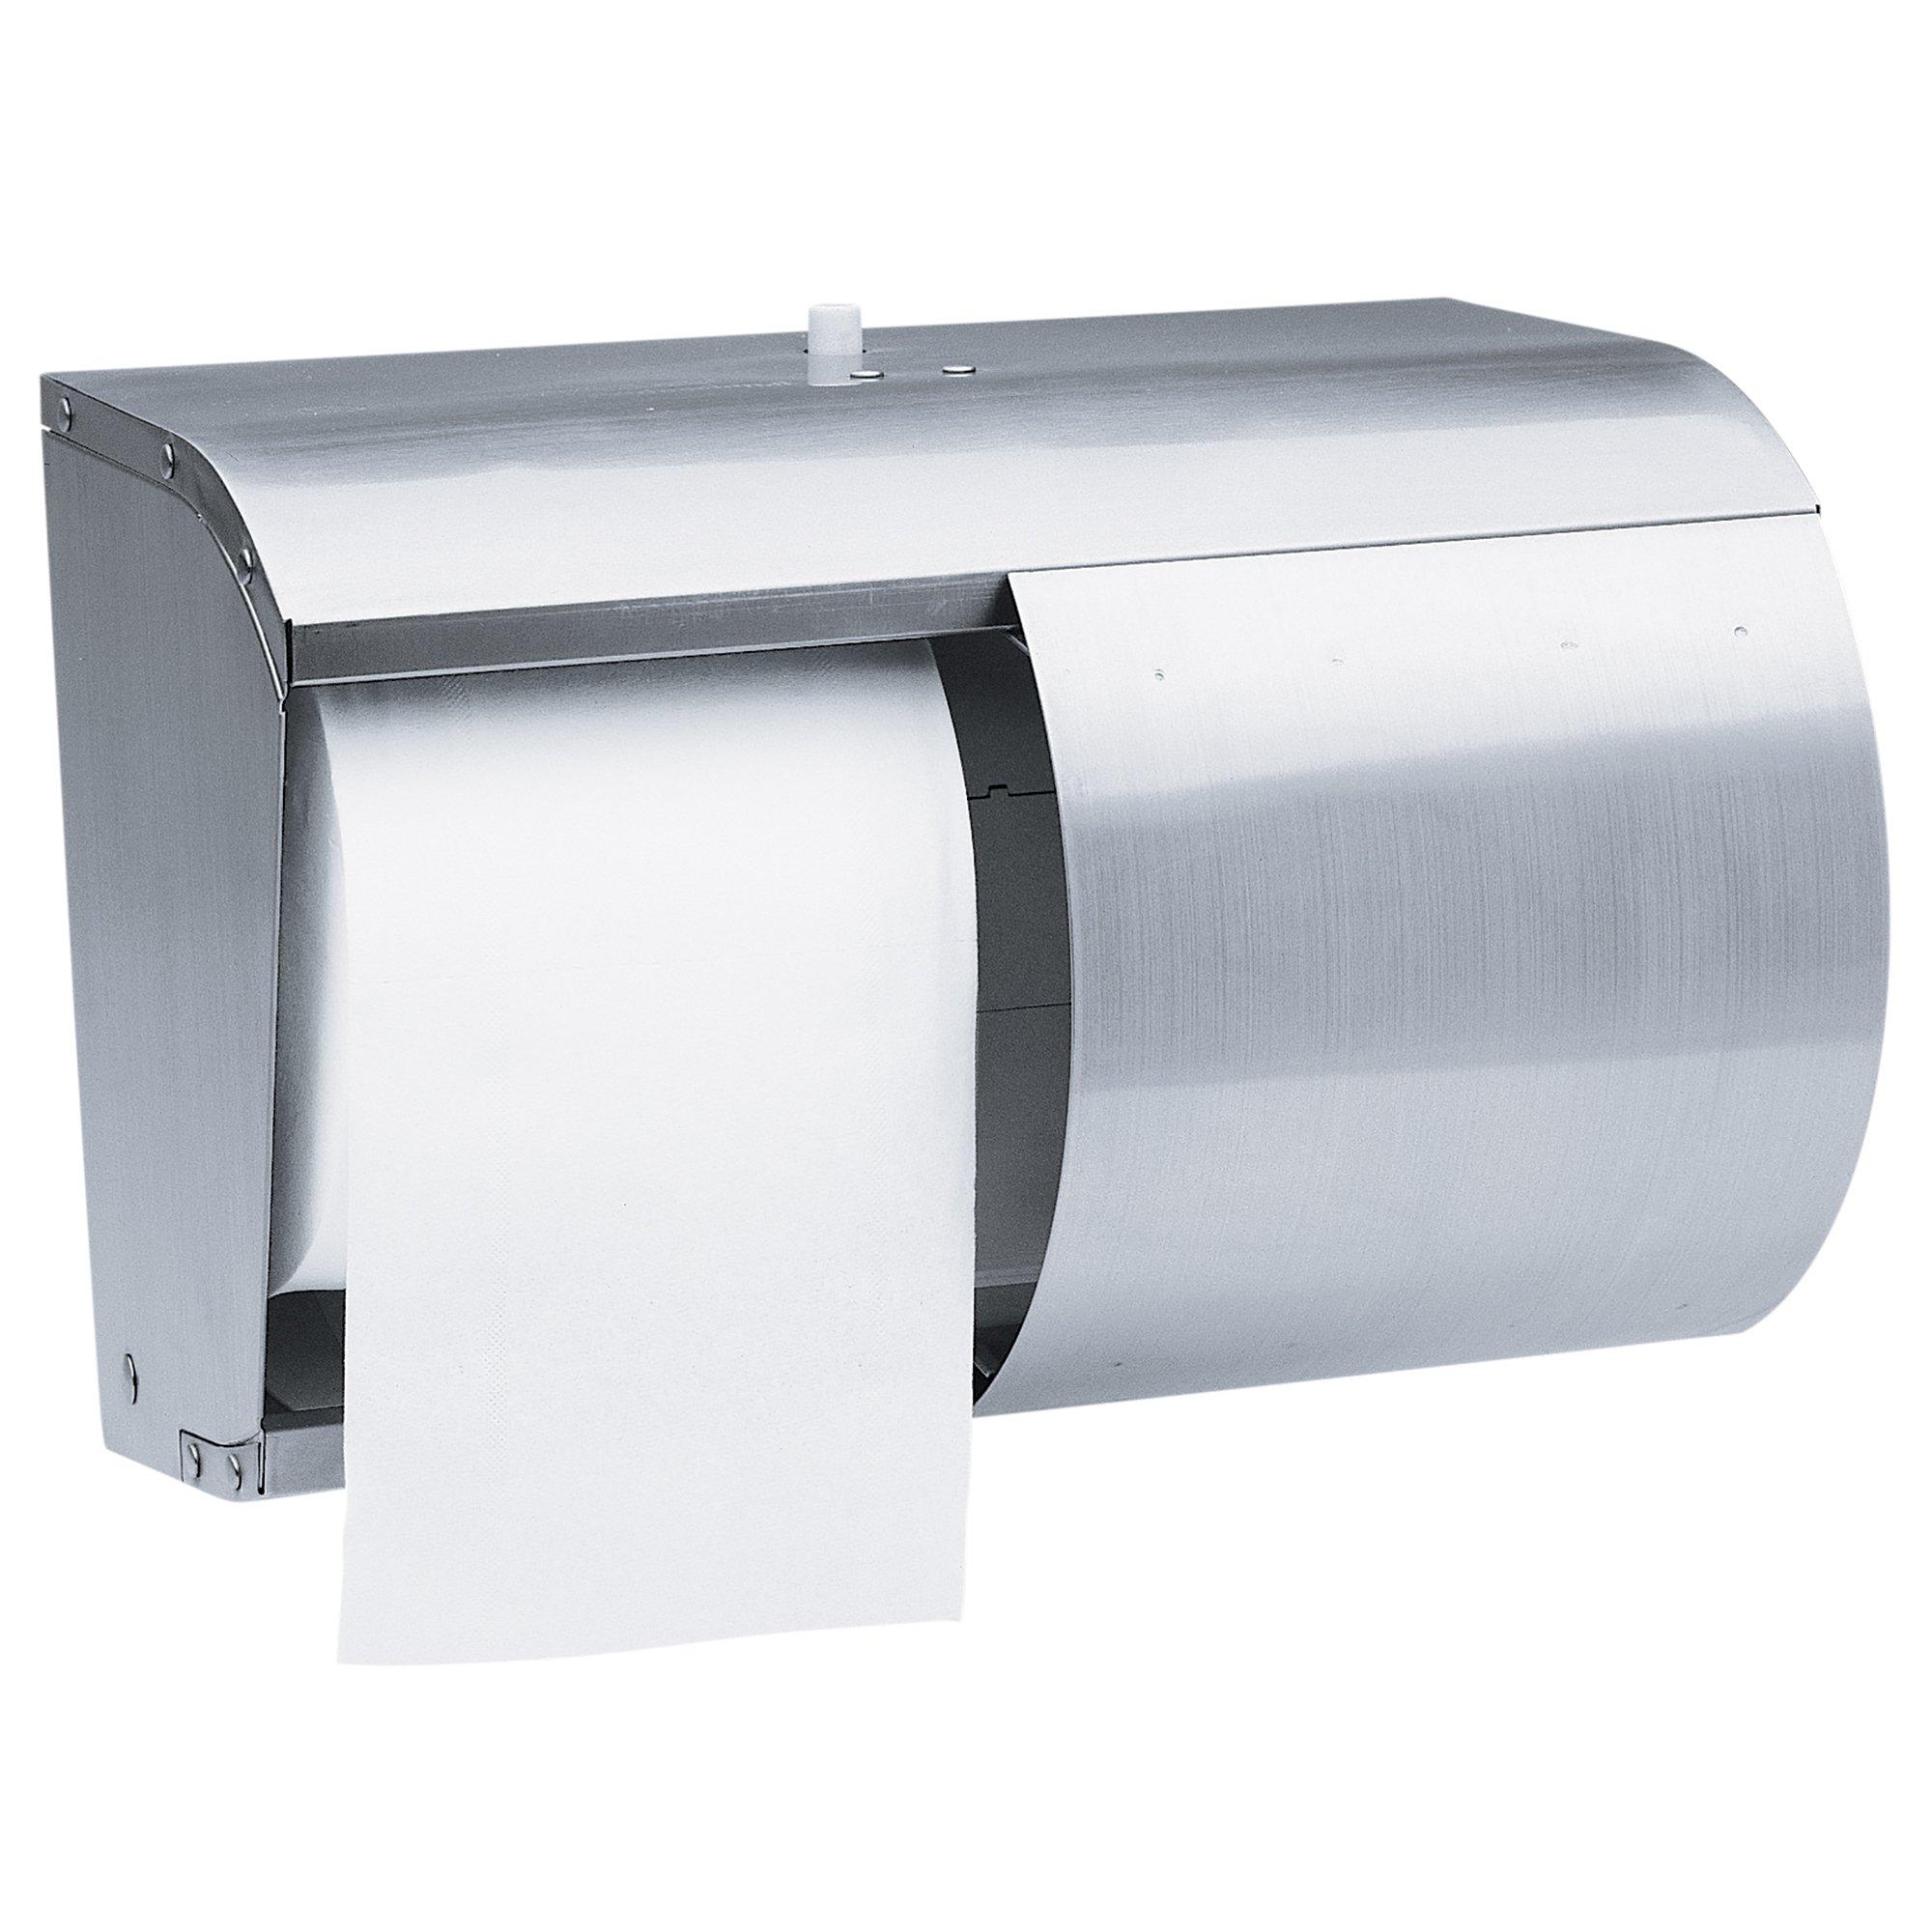 Kimberly Clark Professional Double Roll Coreless Toilet Paper Dispenser (09606), Stainless Steel